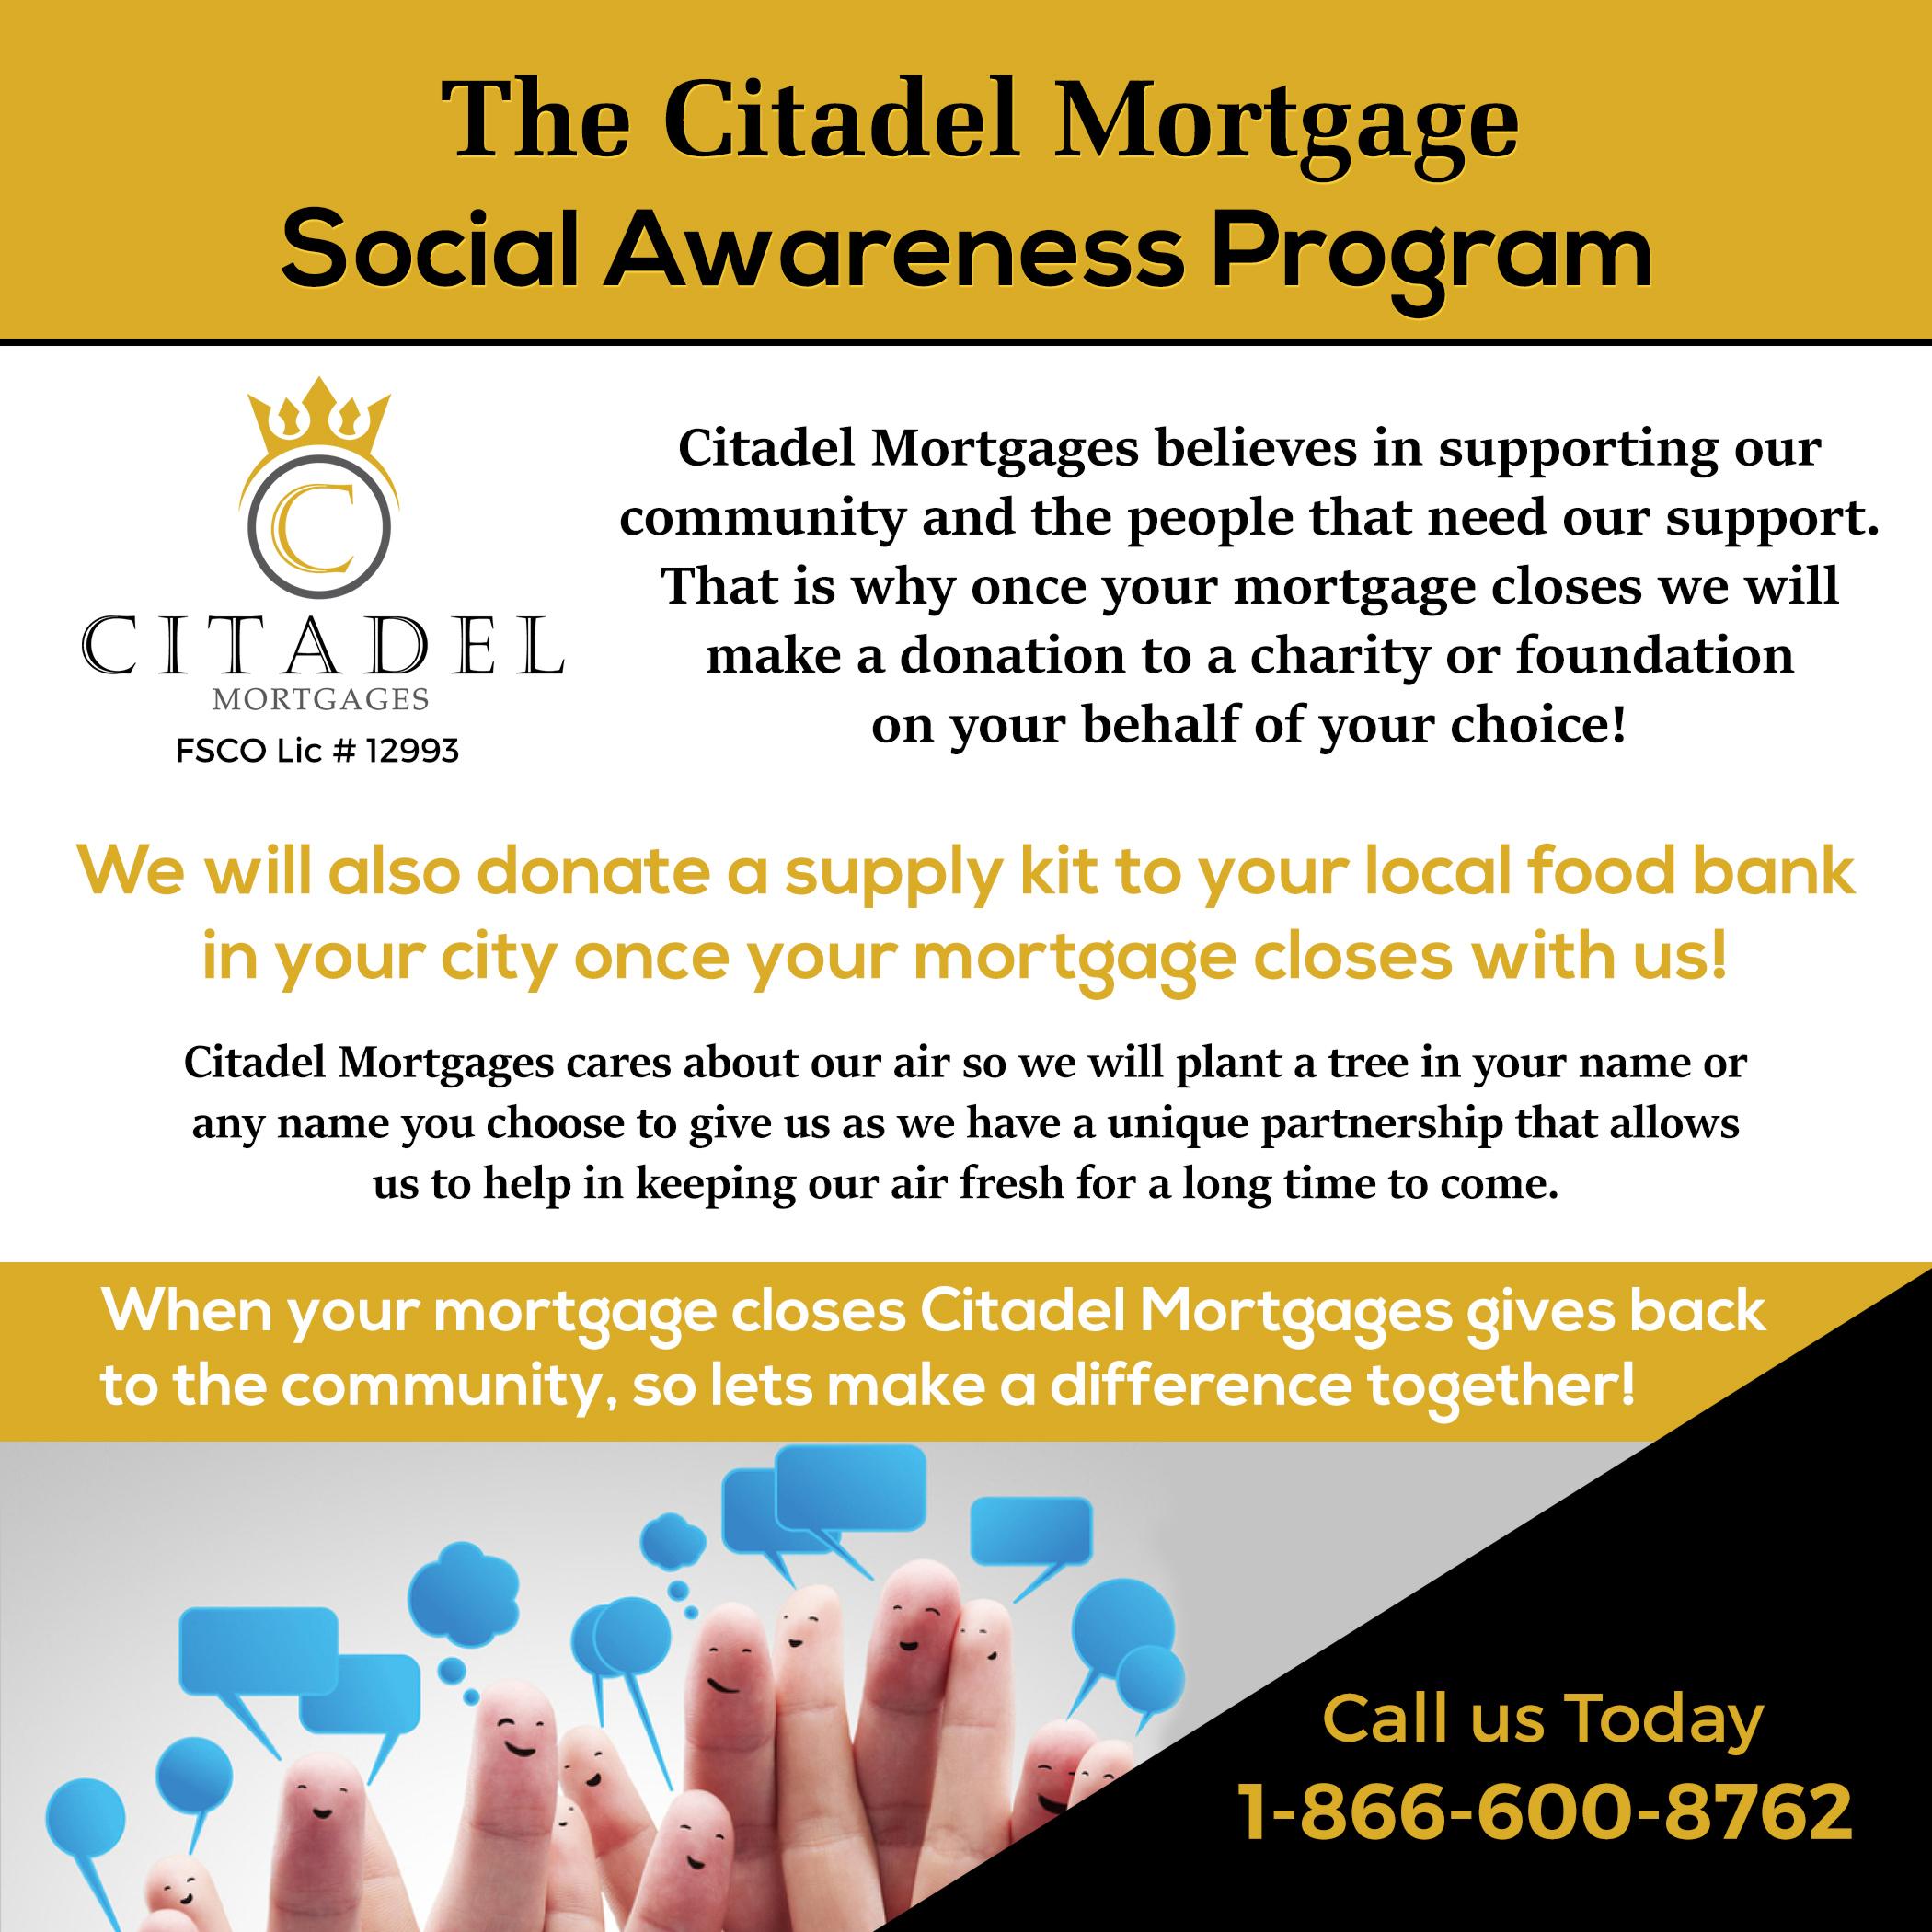 Social Awarenece - Citadel Mortgages